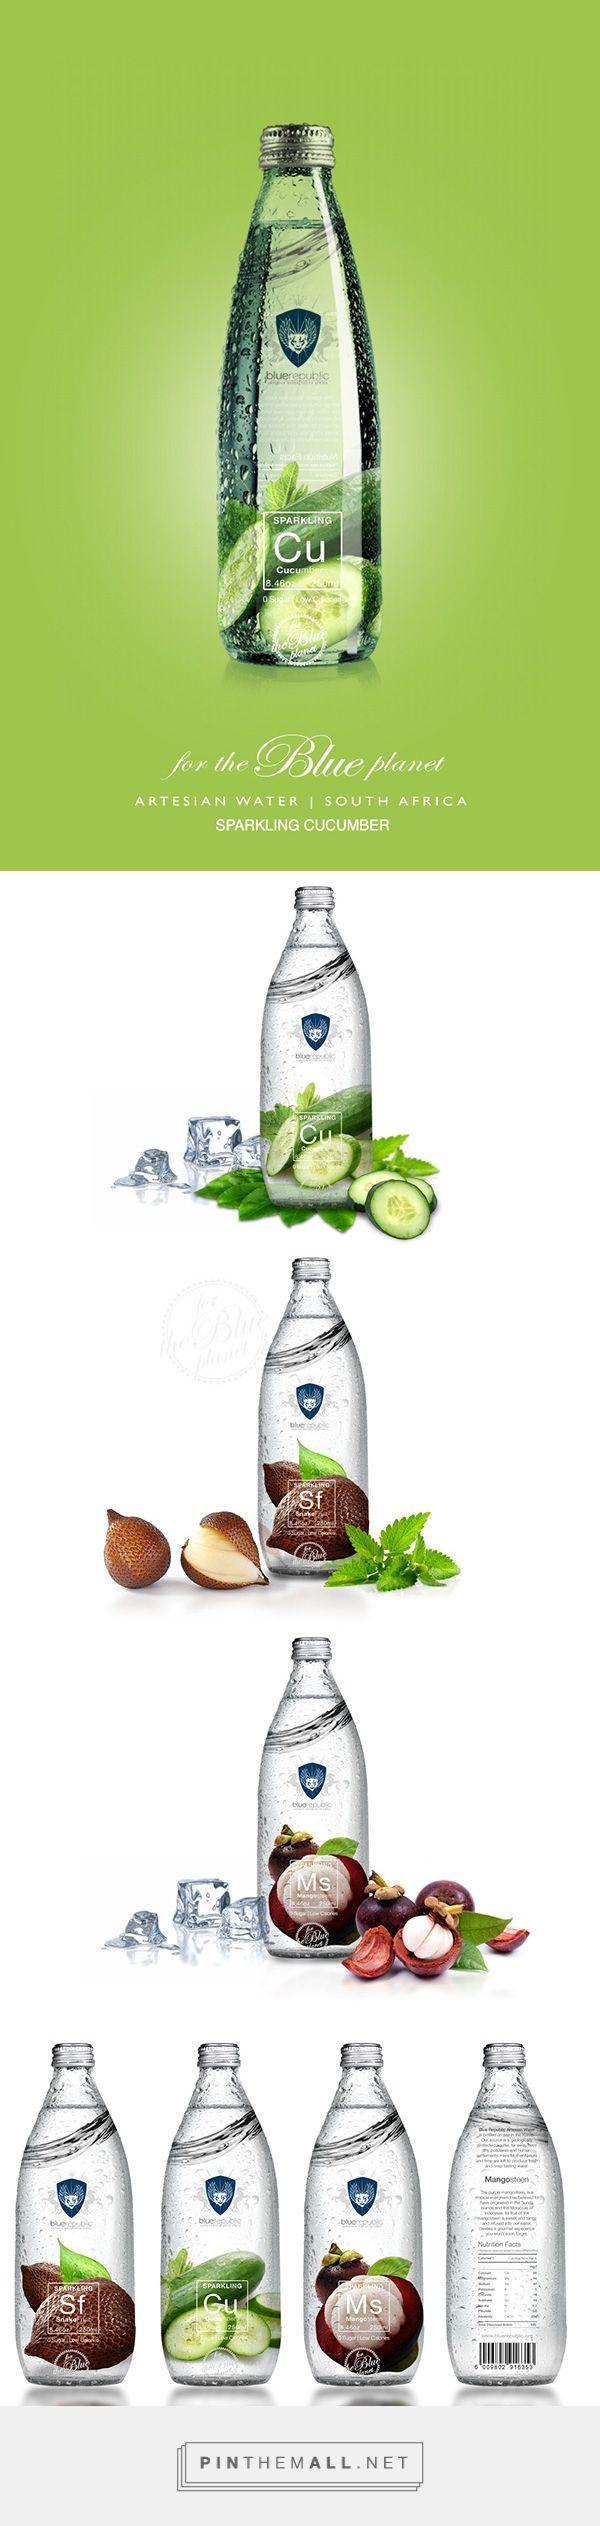 Blue Republic flavored water range by Batsirai Madzonga. Pin curated by #SFields99 #packaging #design